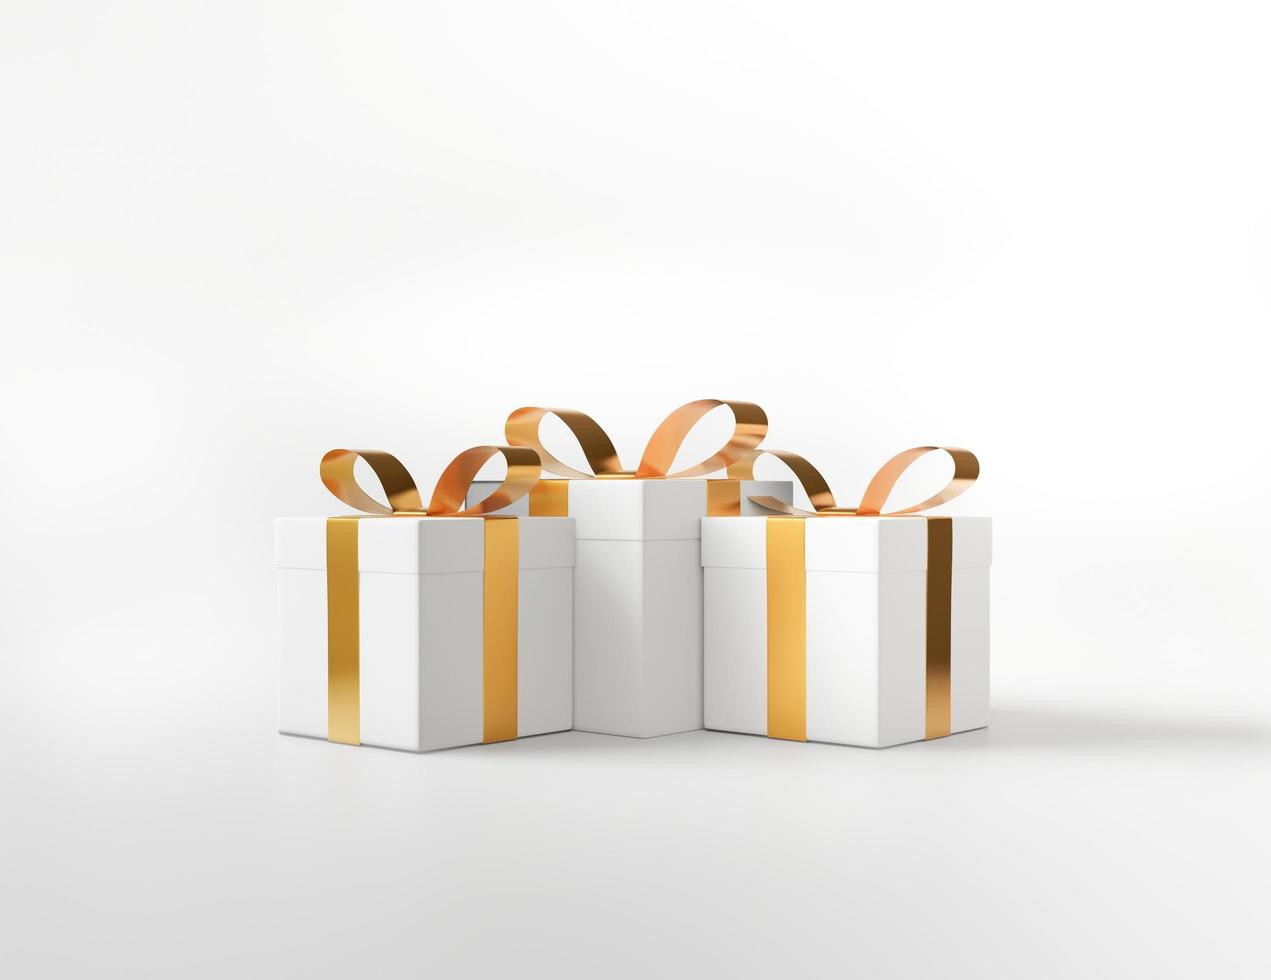 Geschenkboxen des weißen Quadrats 3d foto